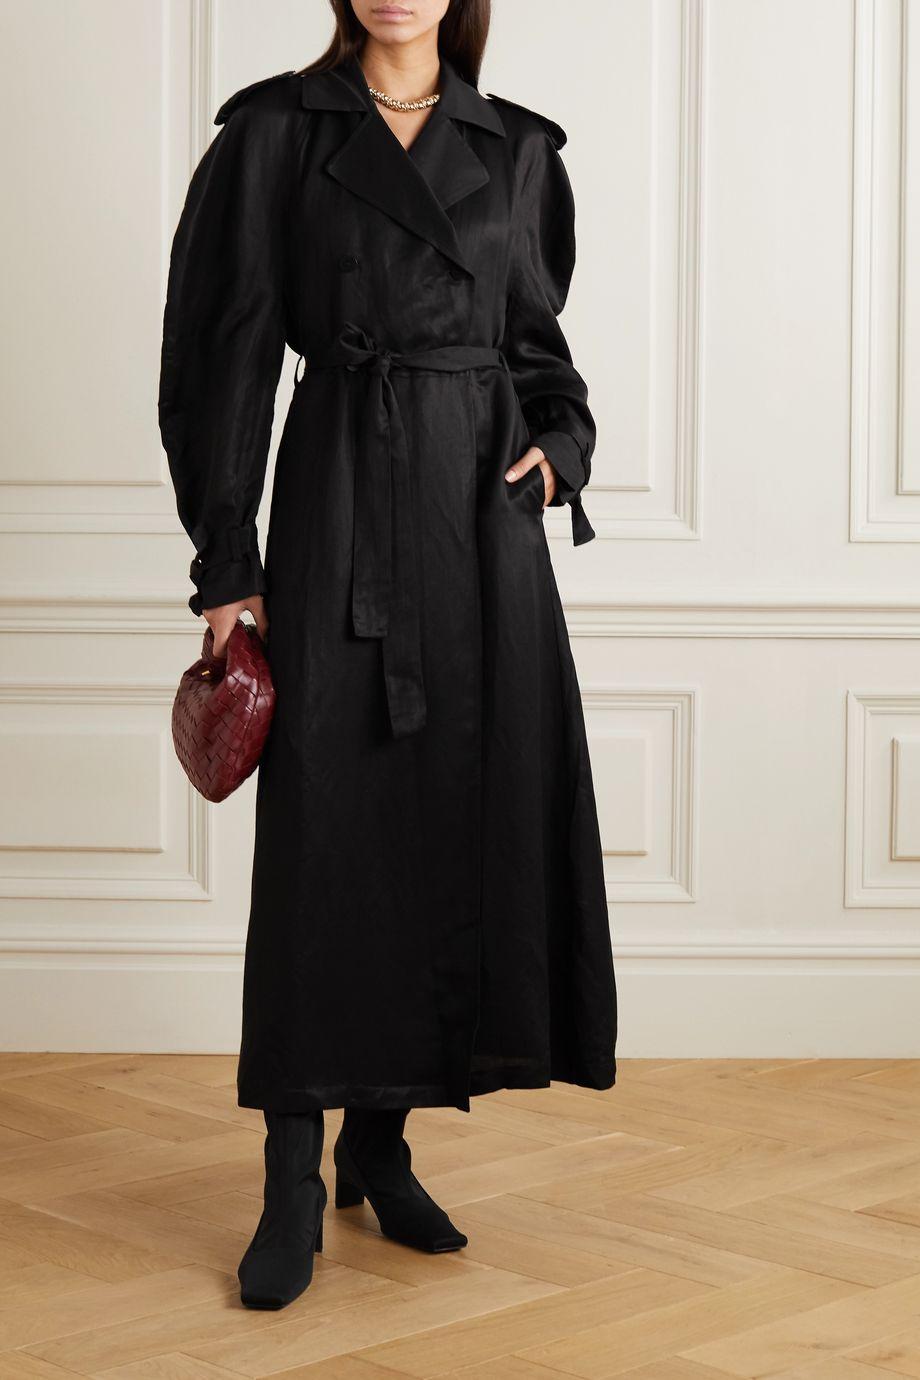 BITE Studios + NET SUSTAIN belted linen-blend maxi dress